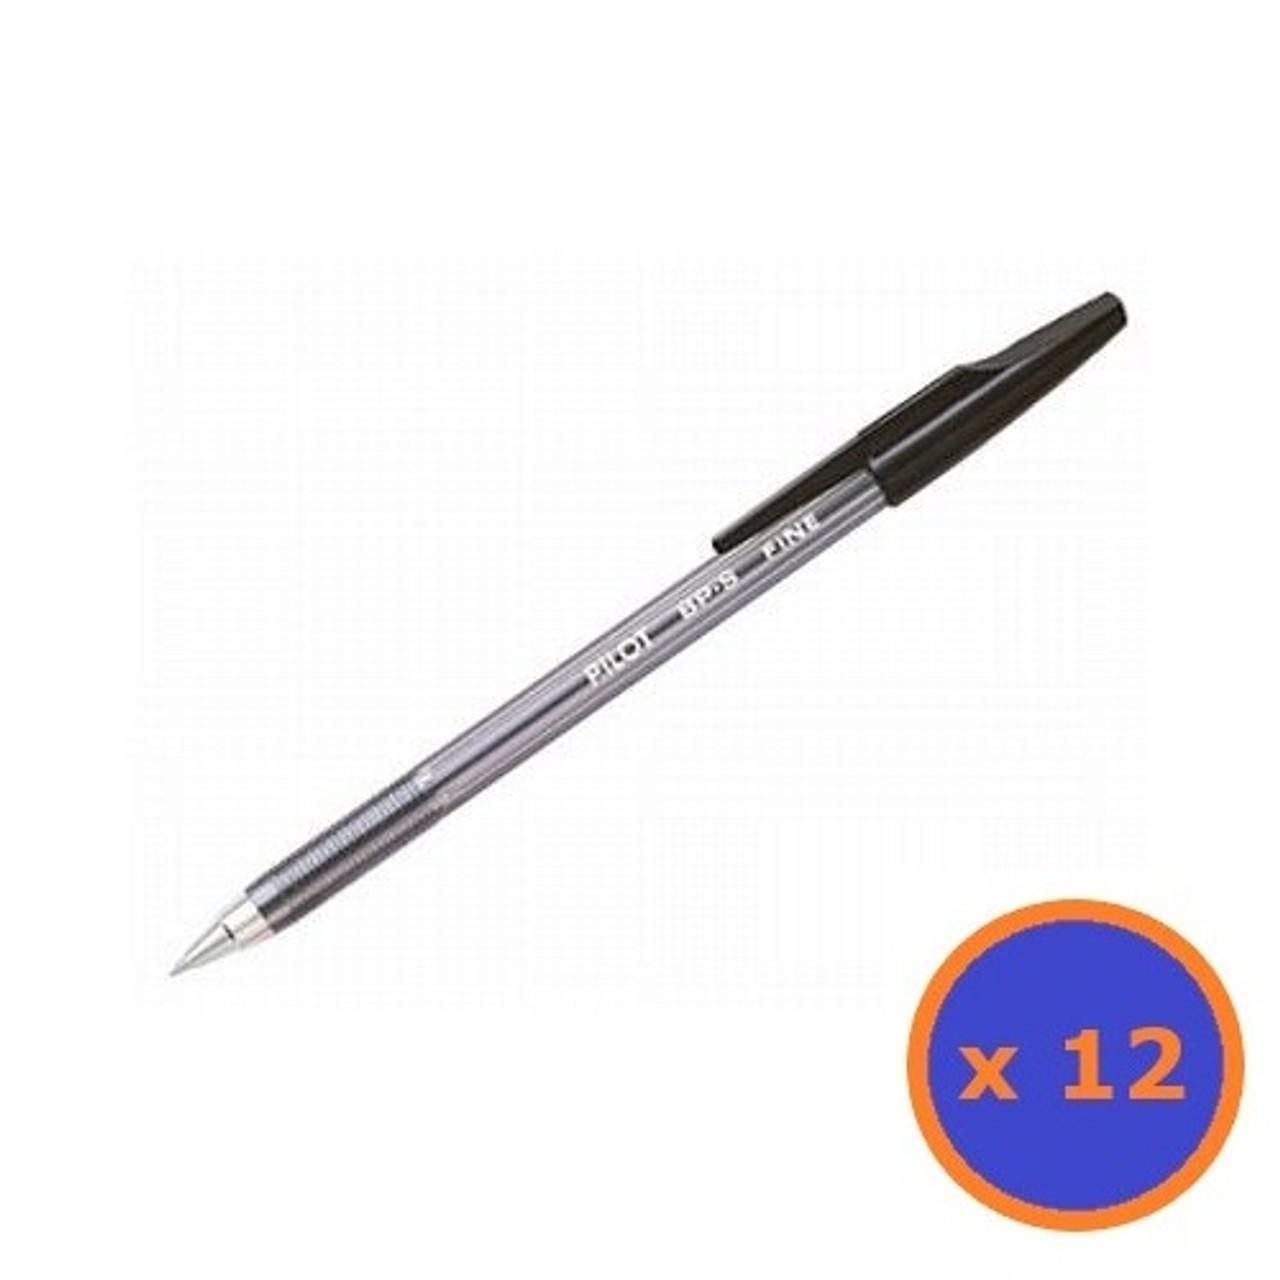 Box of 12 pcs Pilot BPS 0.7mm fine ball point pen VIOLET ink *FREE SHIPMENT